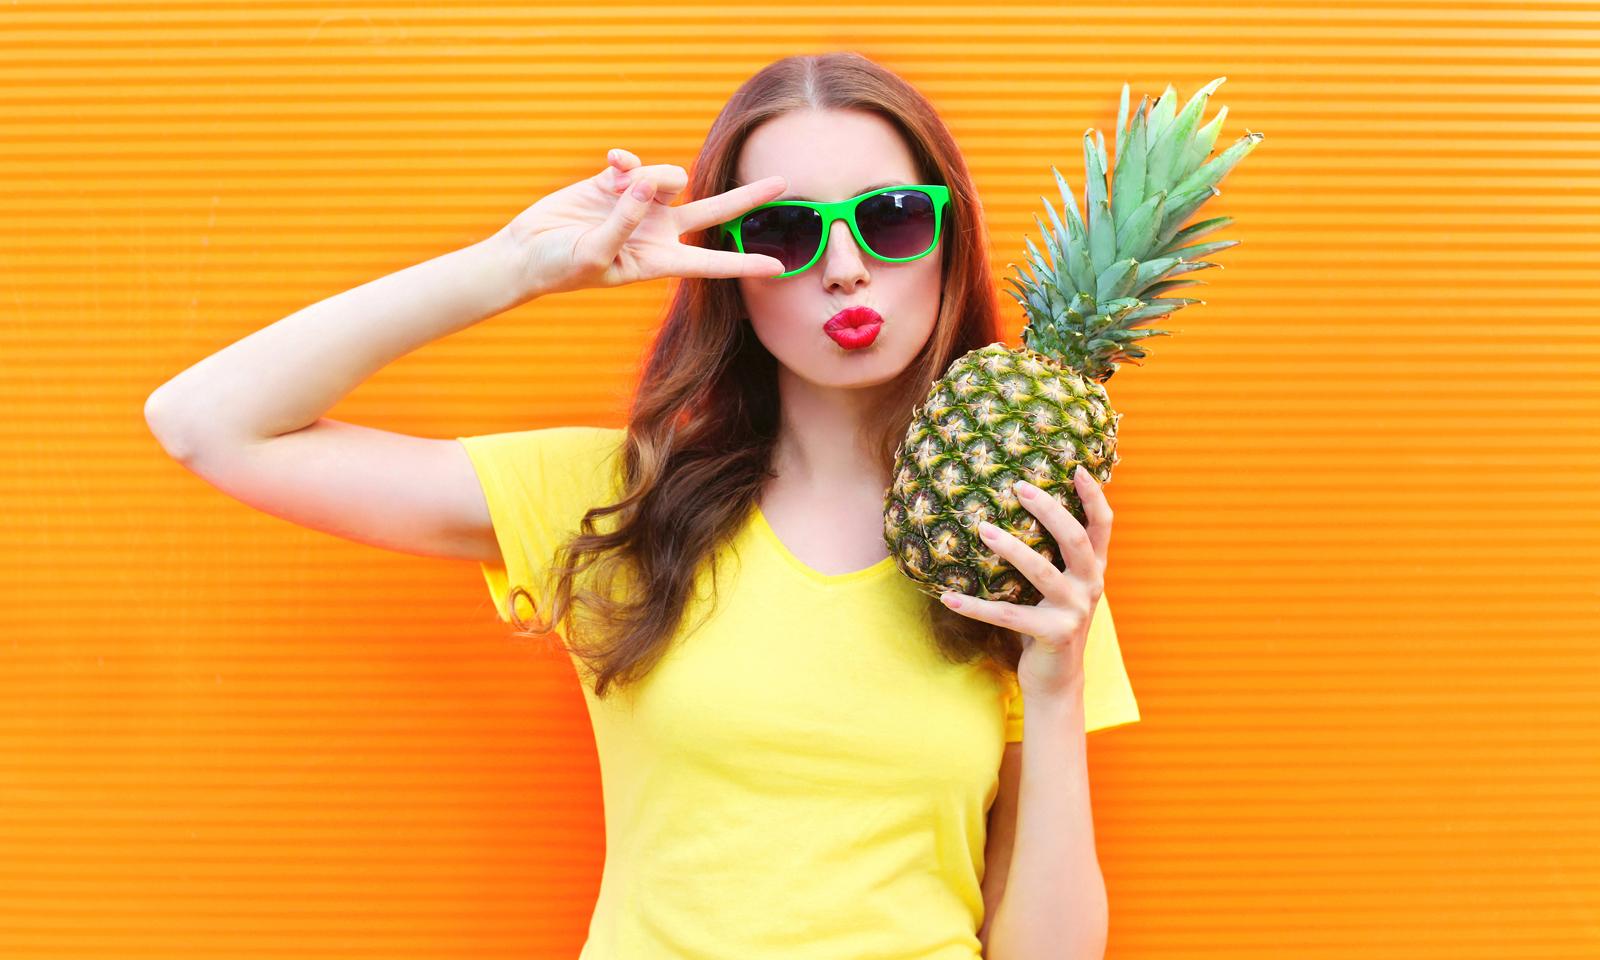 AdobeStock_vegan_woman_pineapple_sunnies_sunglasses_yellow_orange